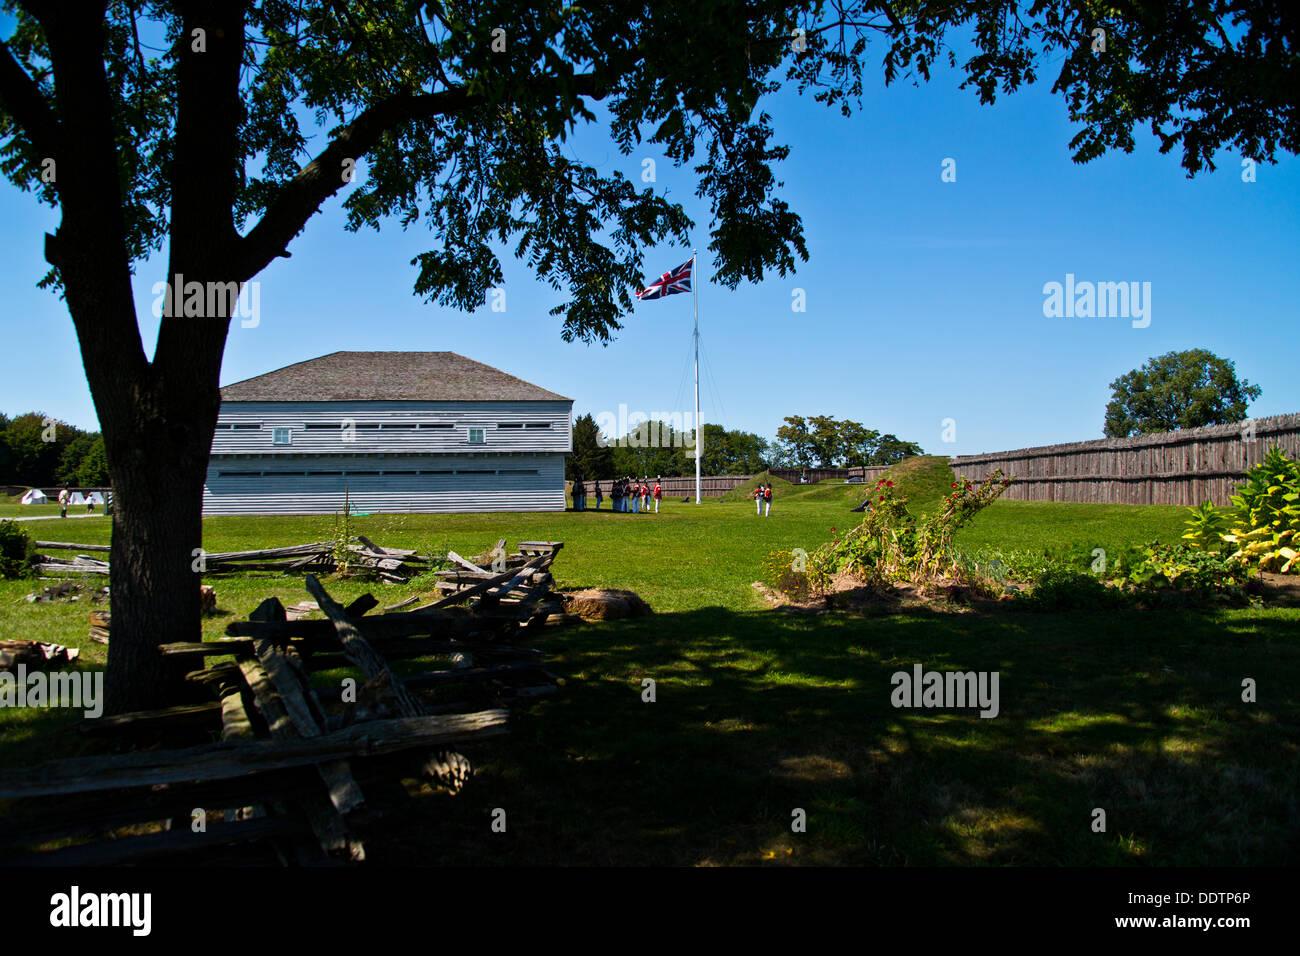 Fort George Niagara sur le lac Ontario Canada Banque D'Images